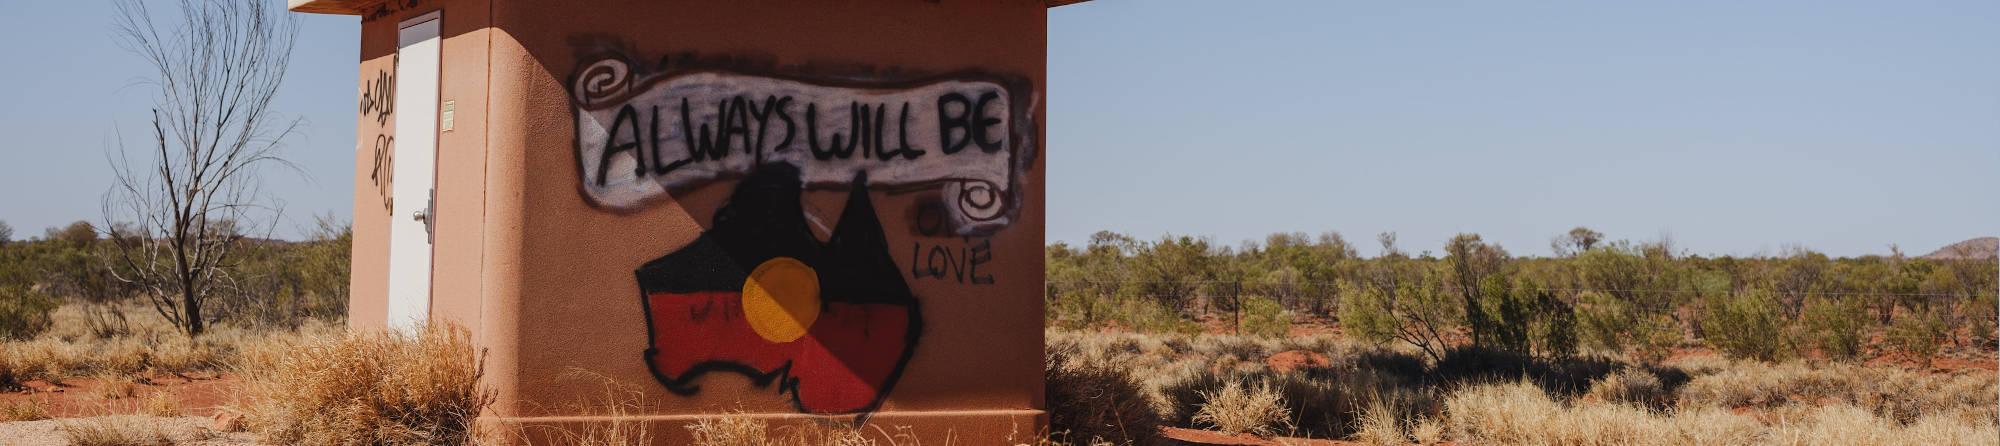 Why you should visit the Uluru-Kata Tjuta National Park Cultural Centre